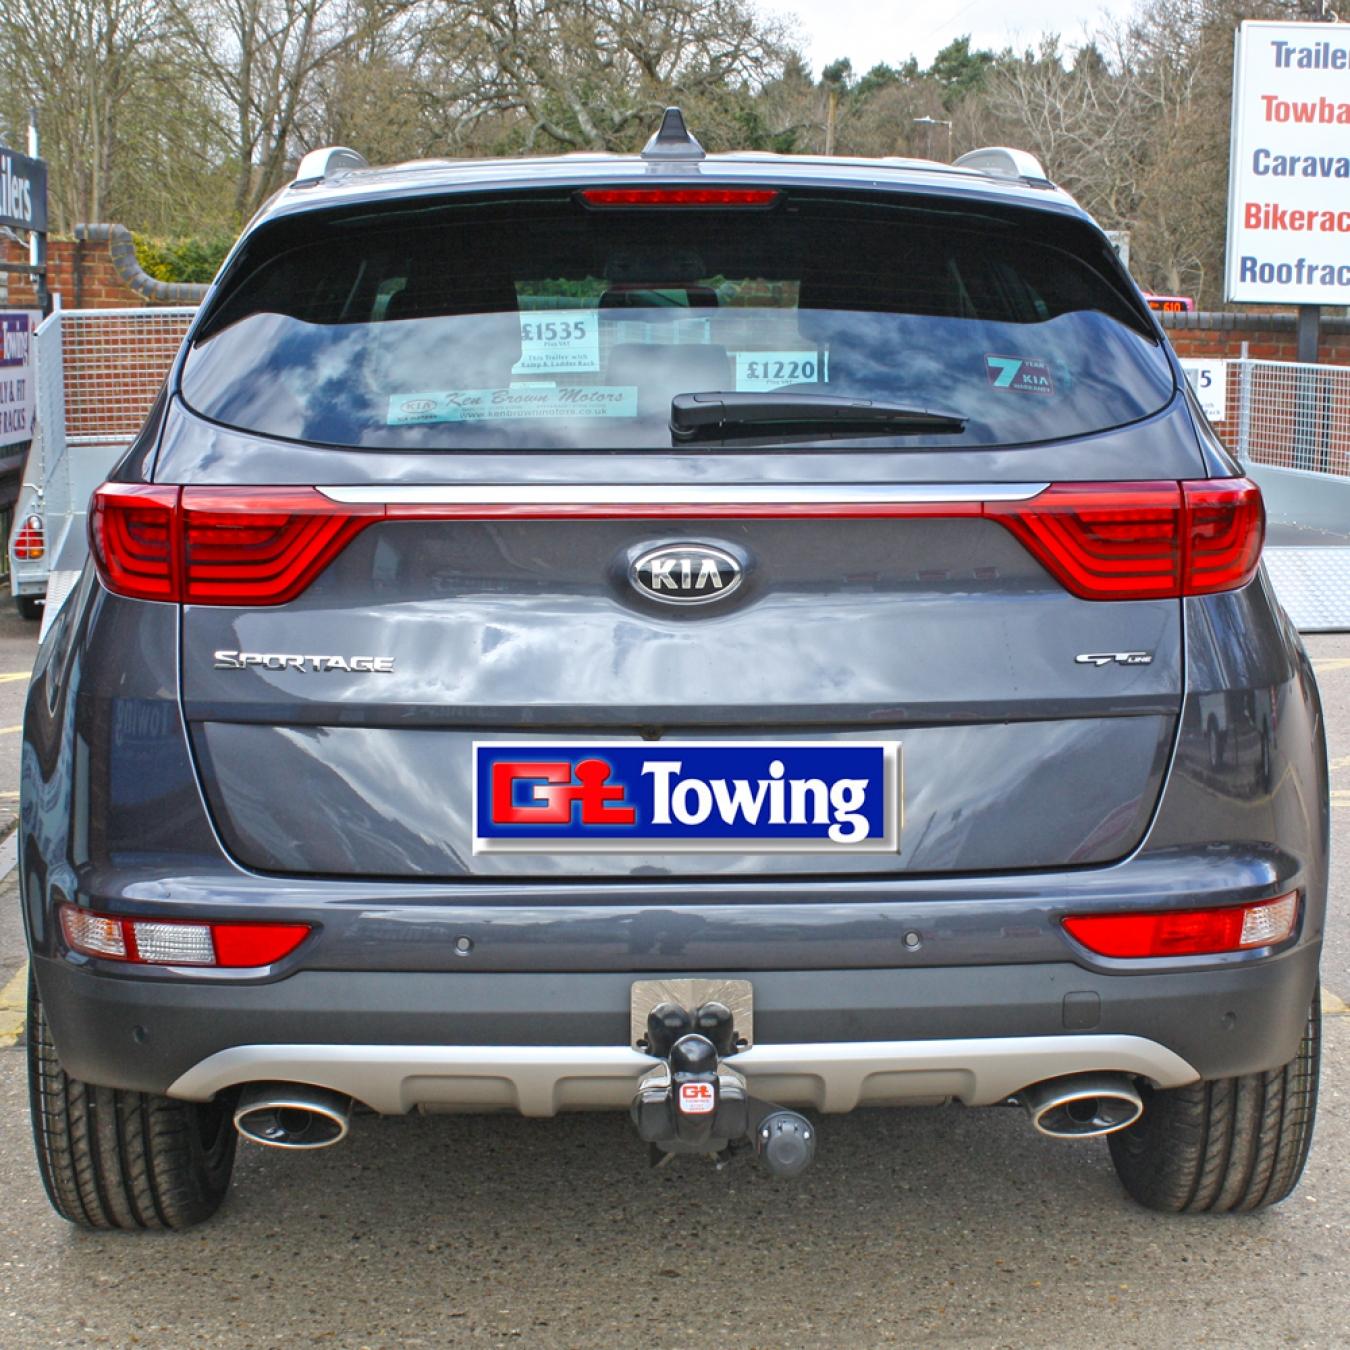 Oris Towbar for Kia Sportage SUV 2010-2015 Detachable Tow Bar